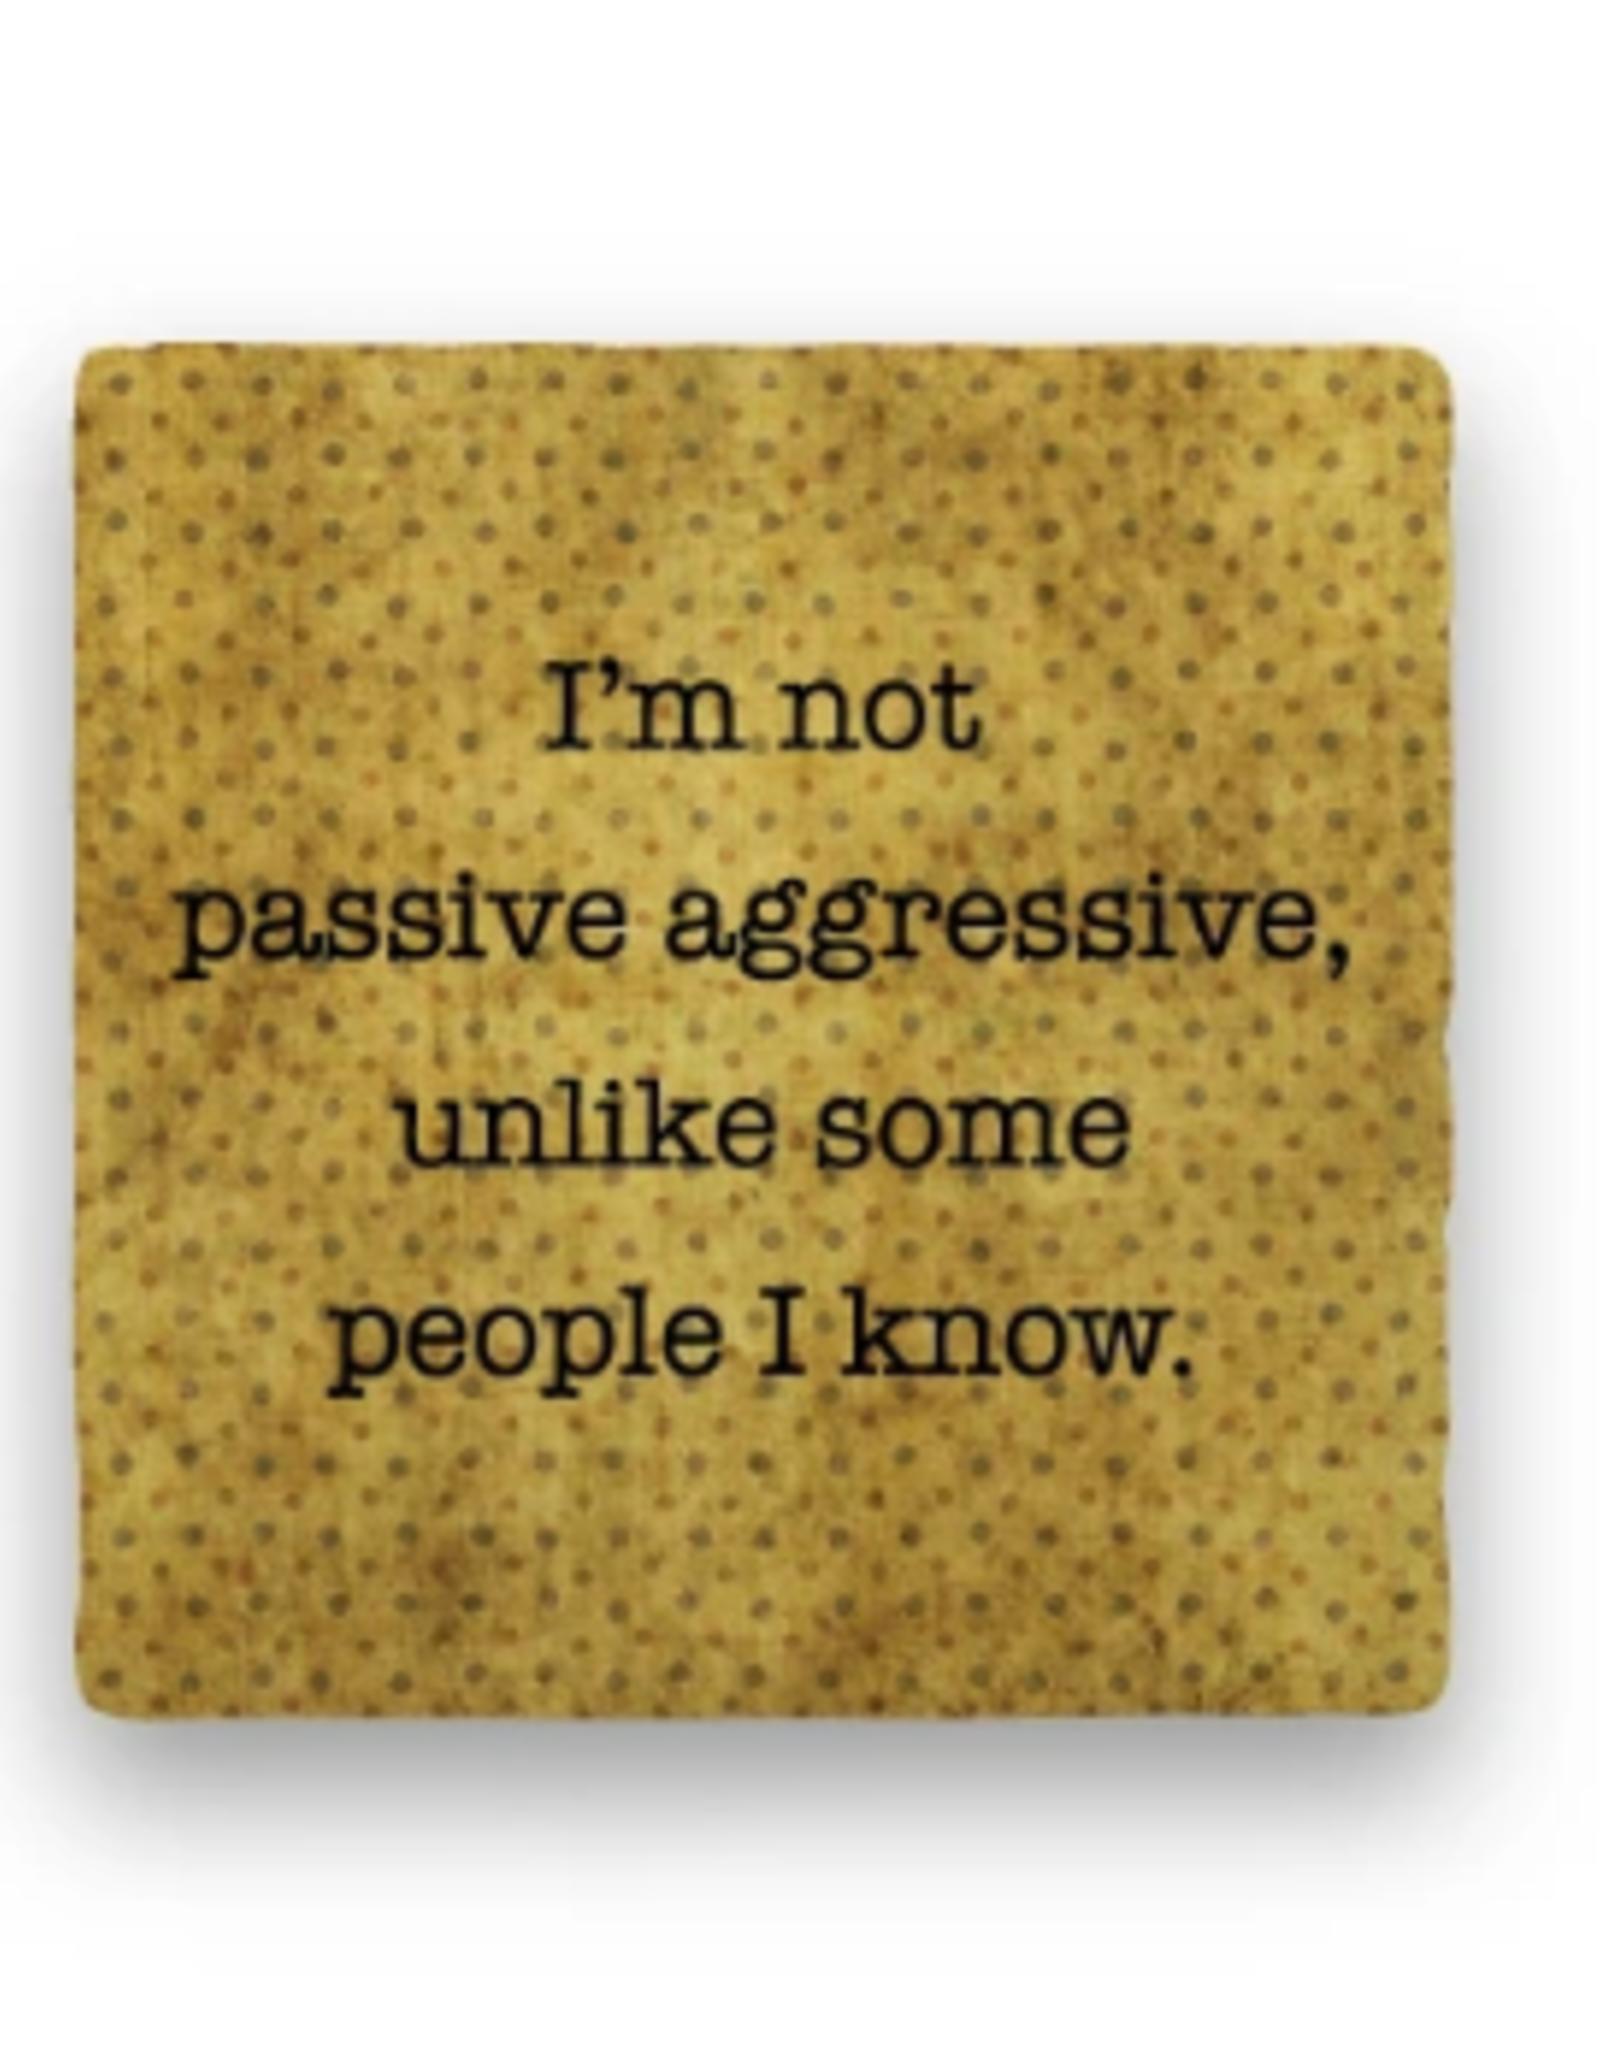 Paisley & Parsley Designs Coaster, Passive Aggressive